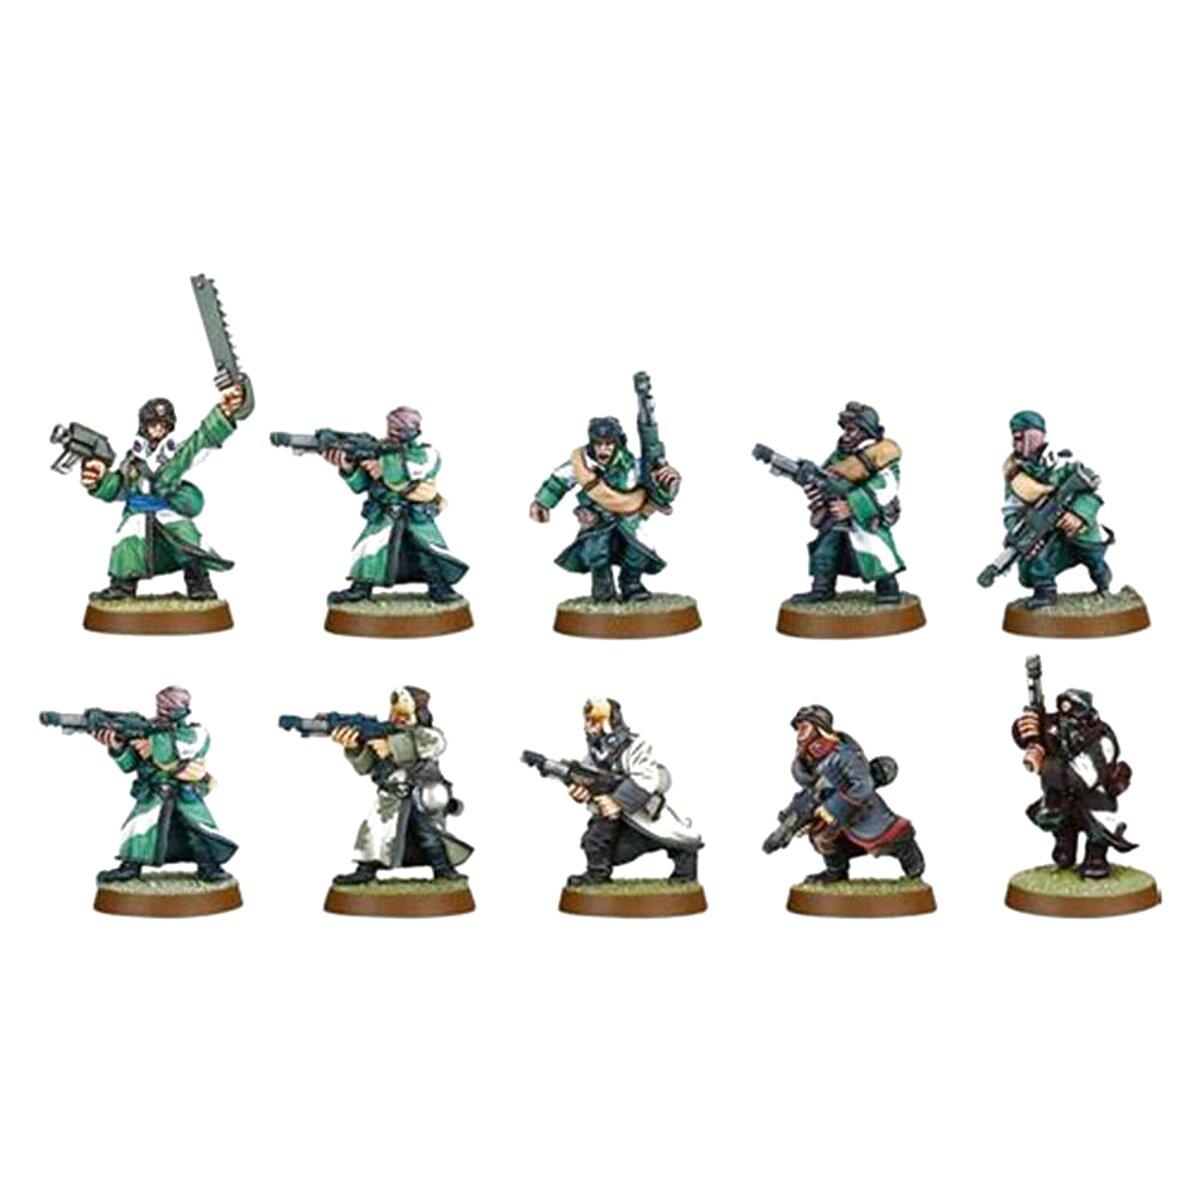 valhallan ice warriors for sale